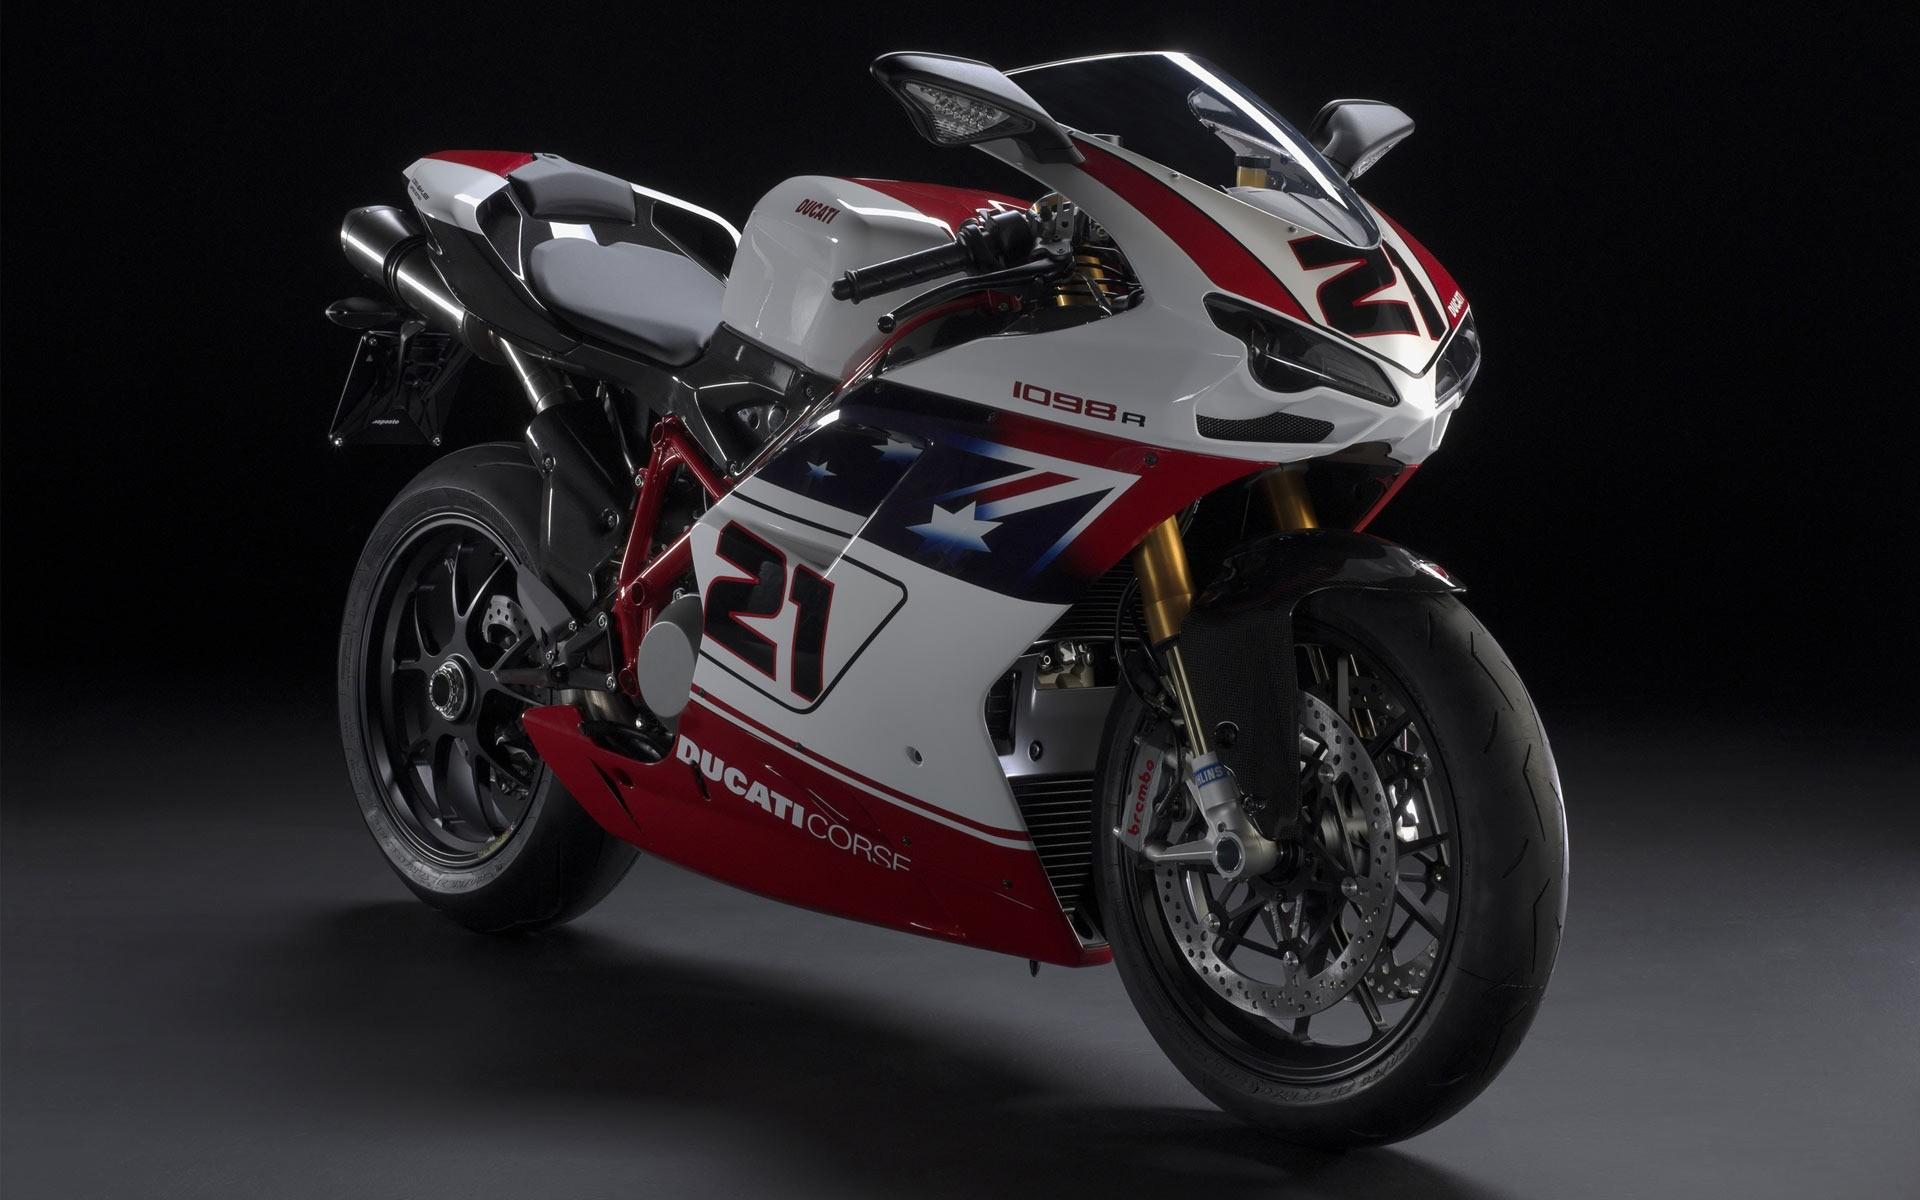 Ducati 1098 R Bayliss Wallpaper Ducati Motorcycles Wallpapers